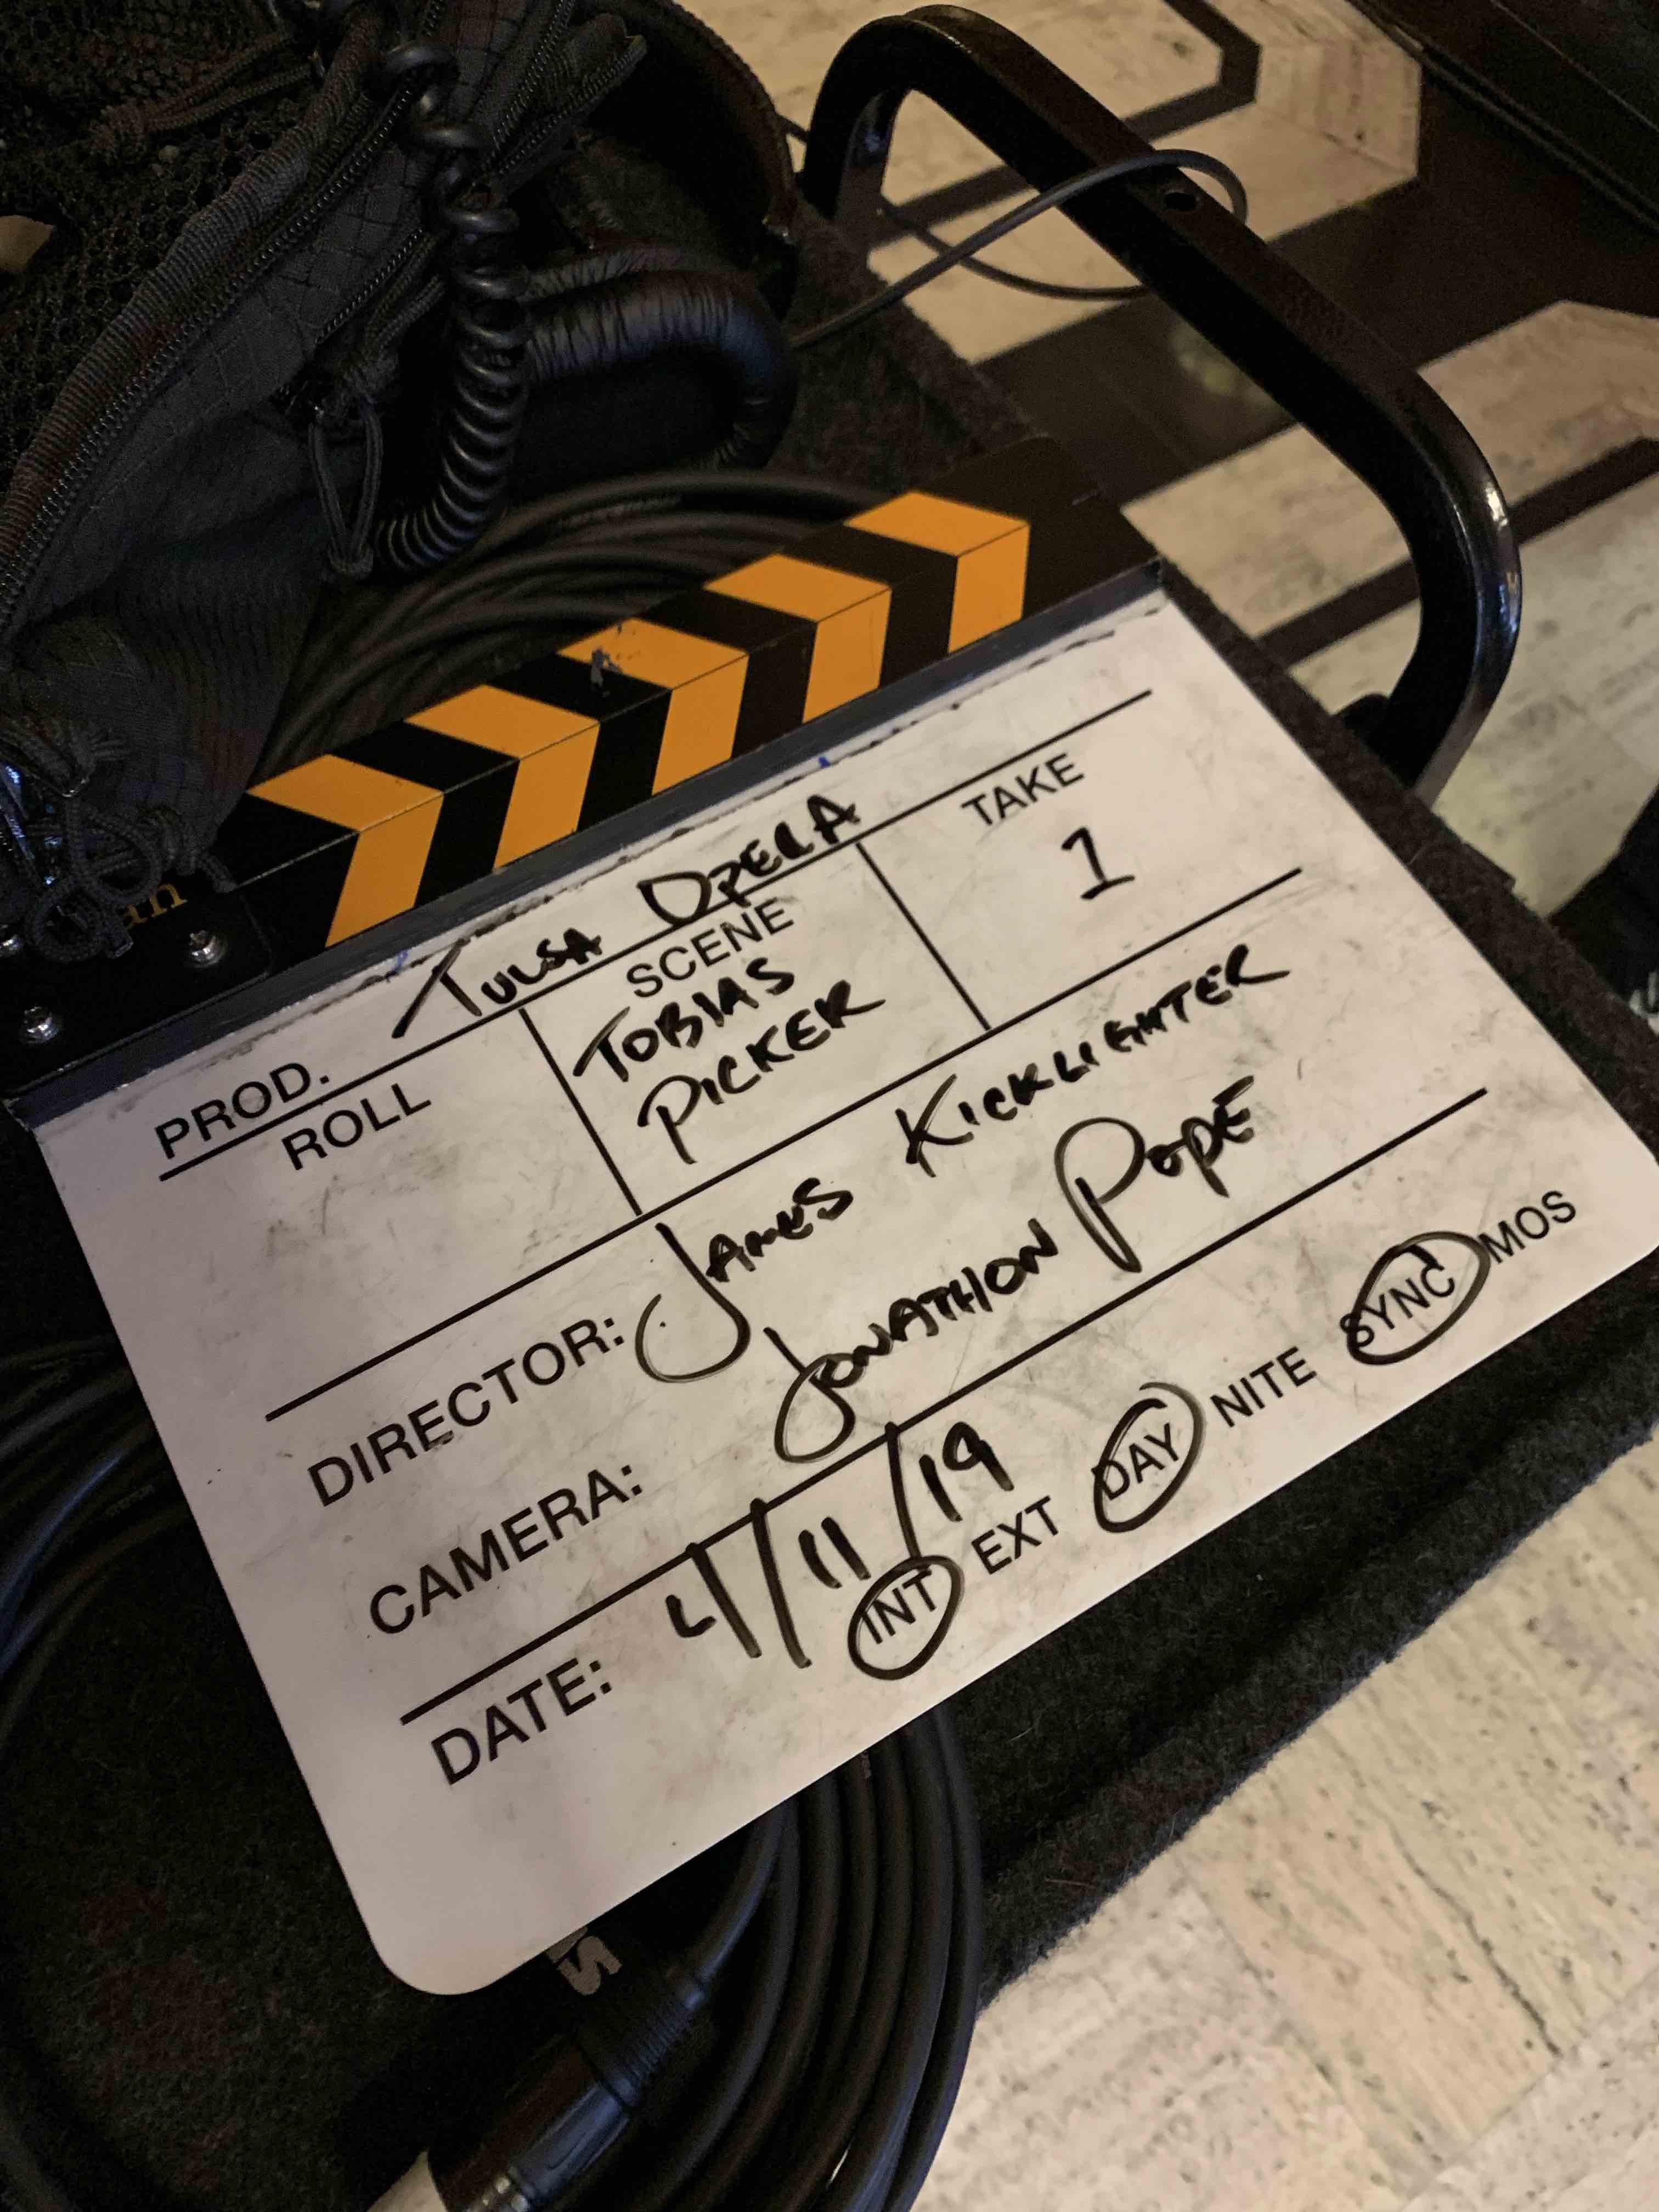 Lucia_Lucas_Don_Giovanni_Tulsa_Documentary_James_Kicklighter_Jonathan_Pope